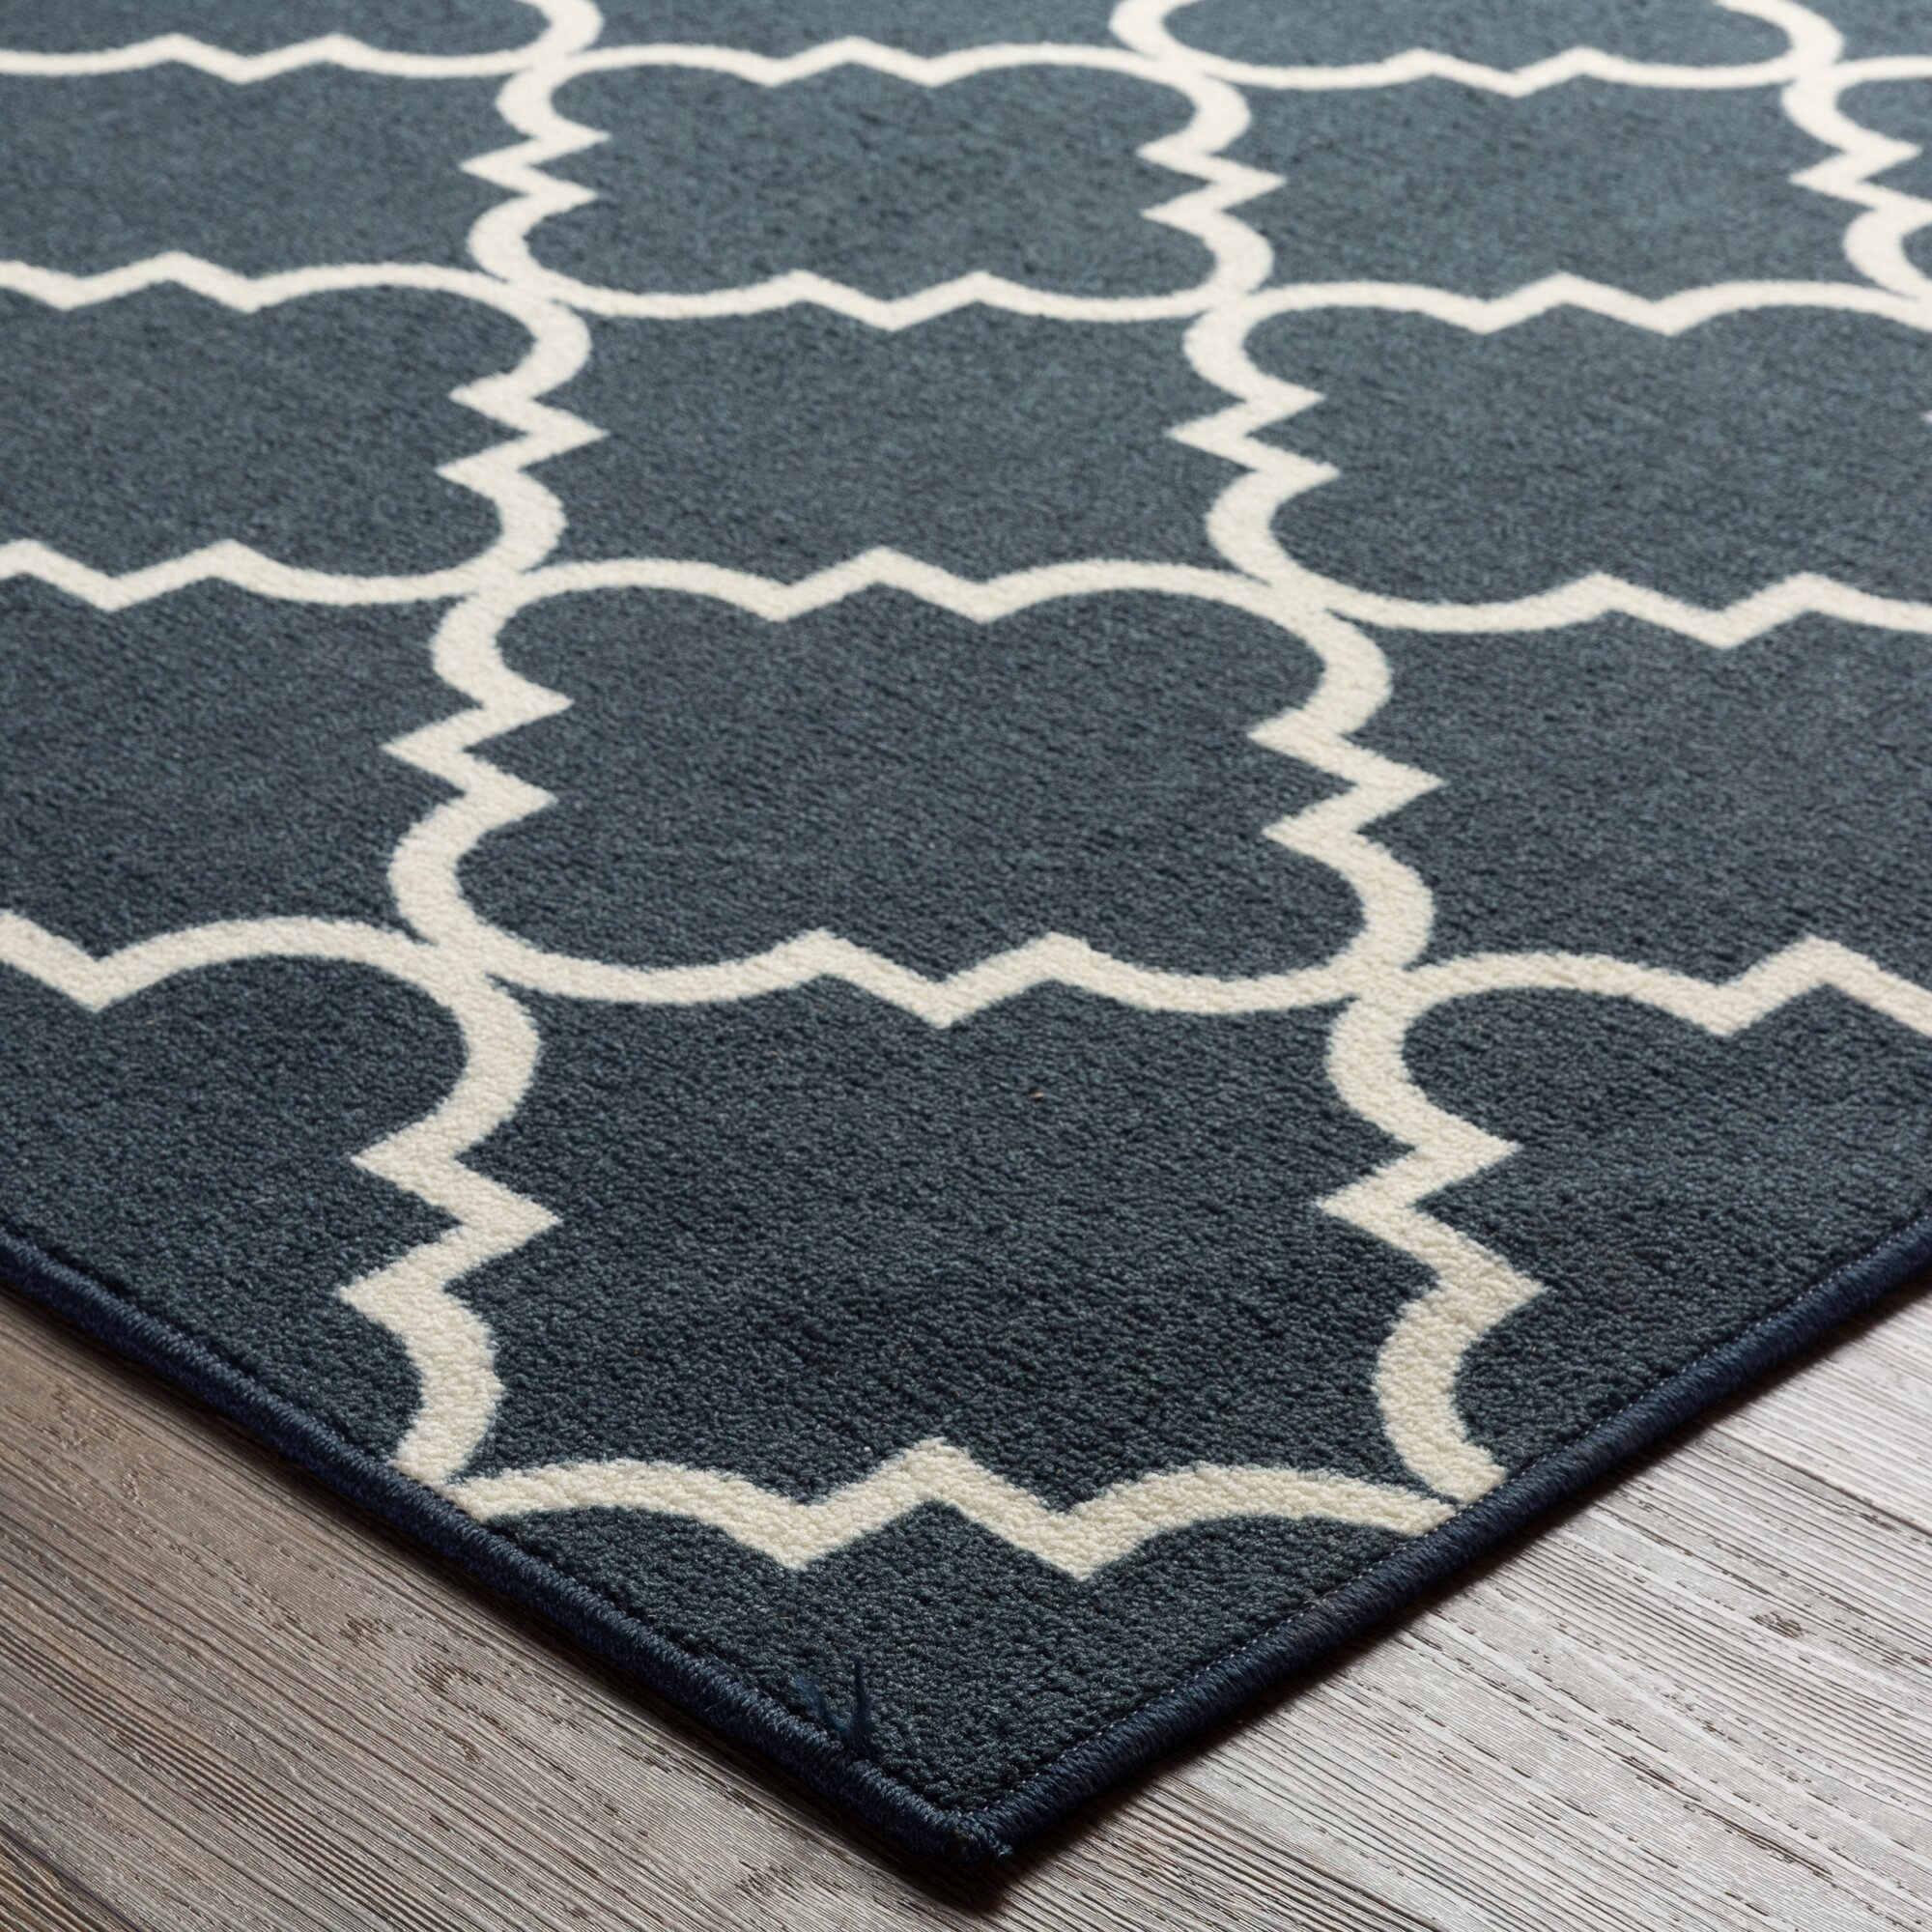 hanley navy blue white area rug reviews birch lane. Black Bedroom Furniture Sets. Home Design Ideas